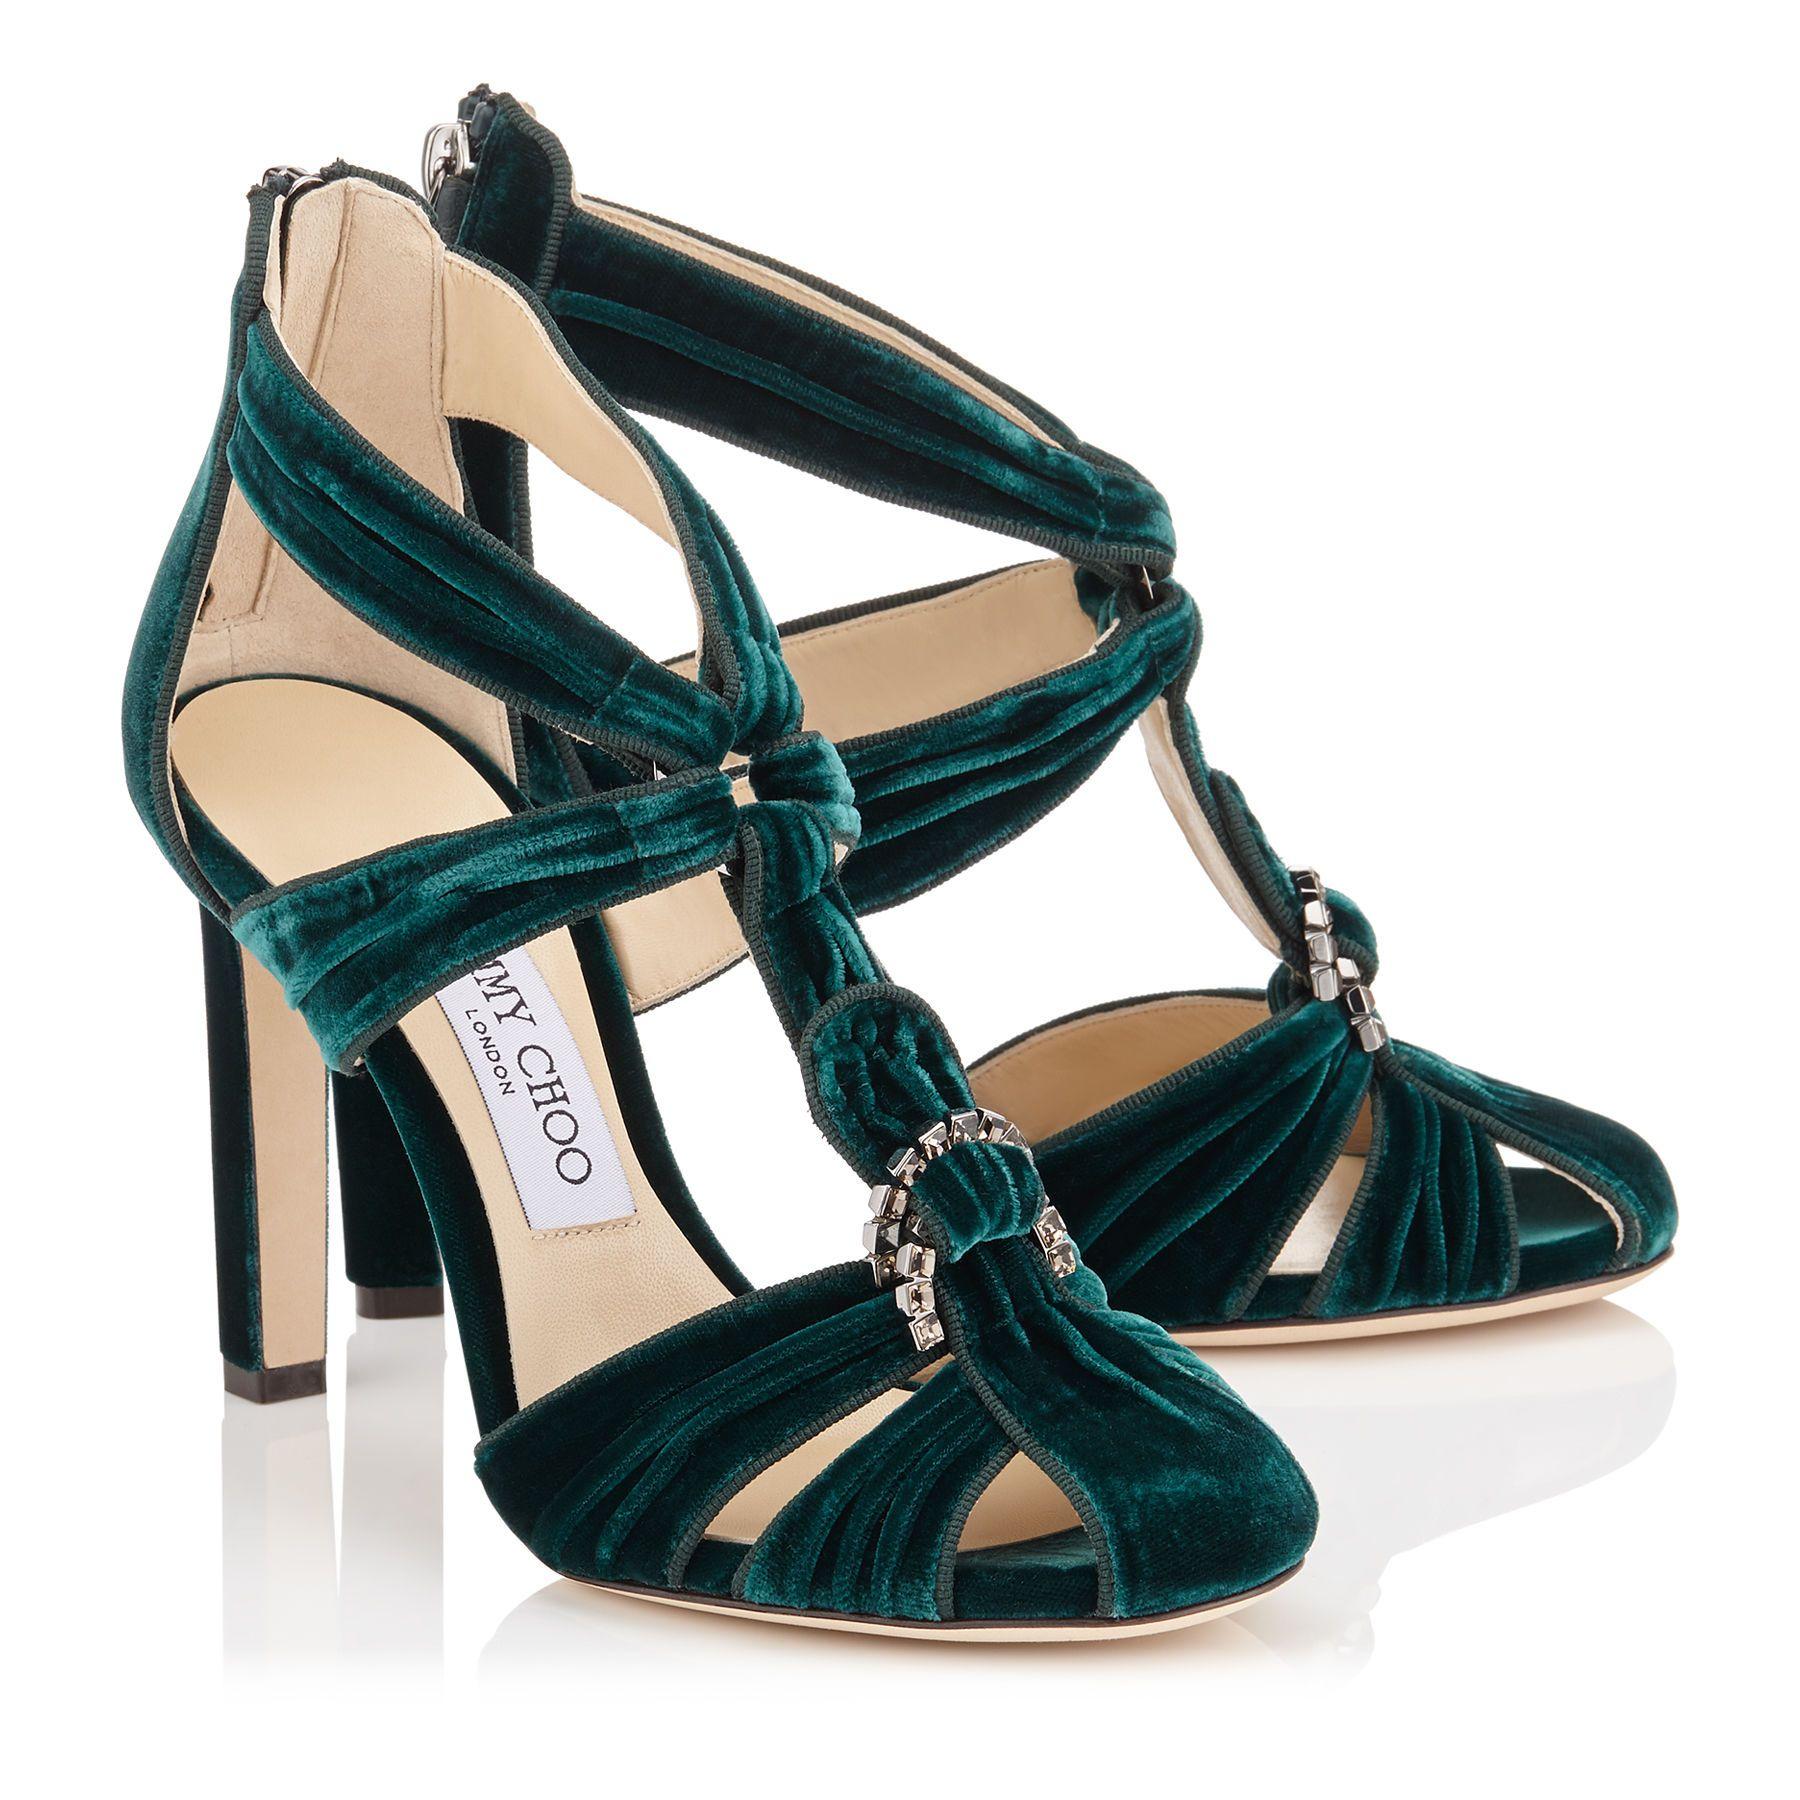 602d0941aa5a Bottle Green Velvet Round Toe Sandals with Swarovski Crystal Brooch ...